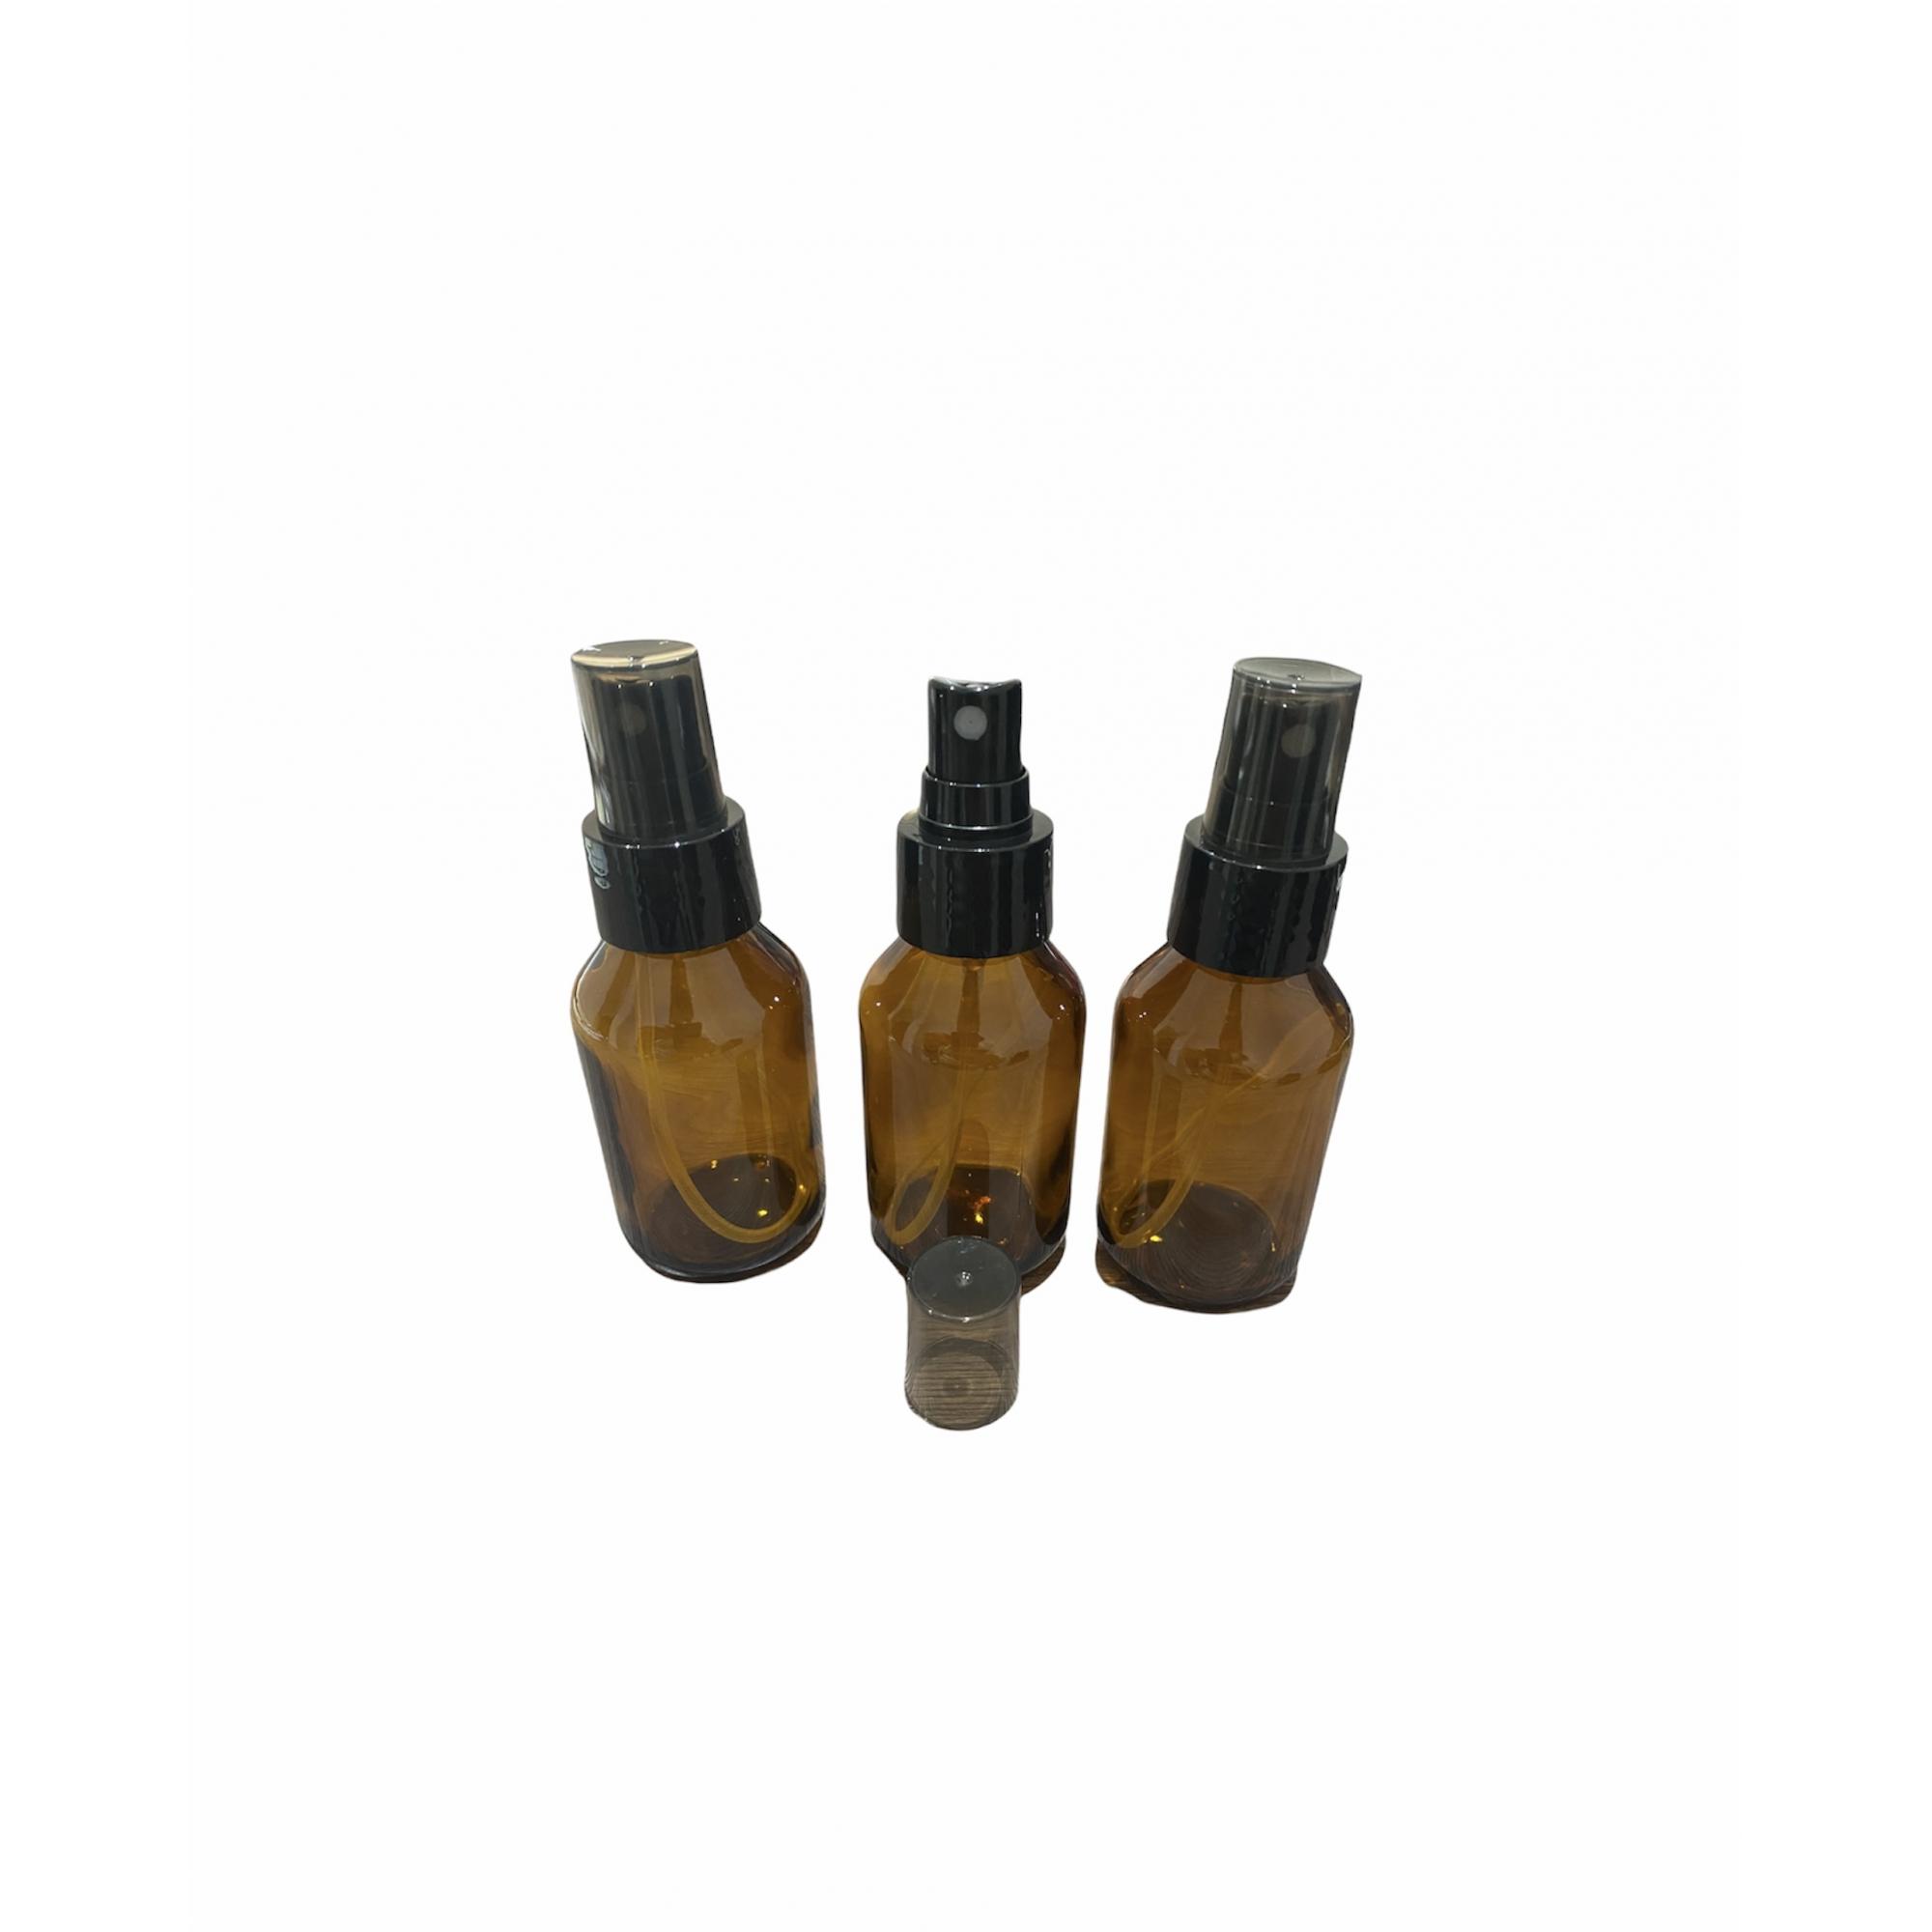 15 Frascos Vidro Âmbar 60ml Spray Válvula Preta Tp Incolor